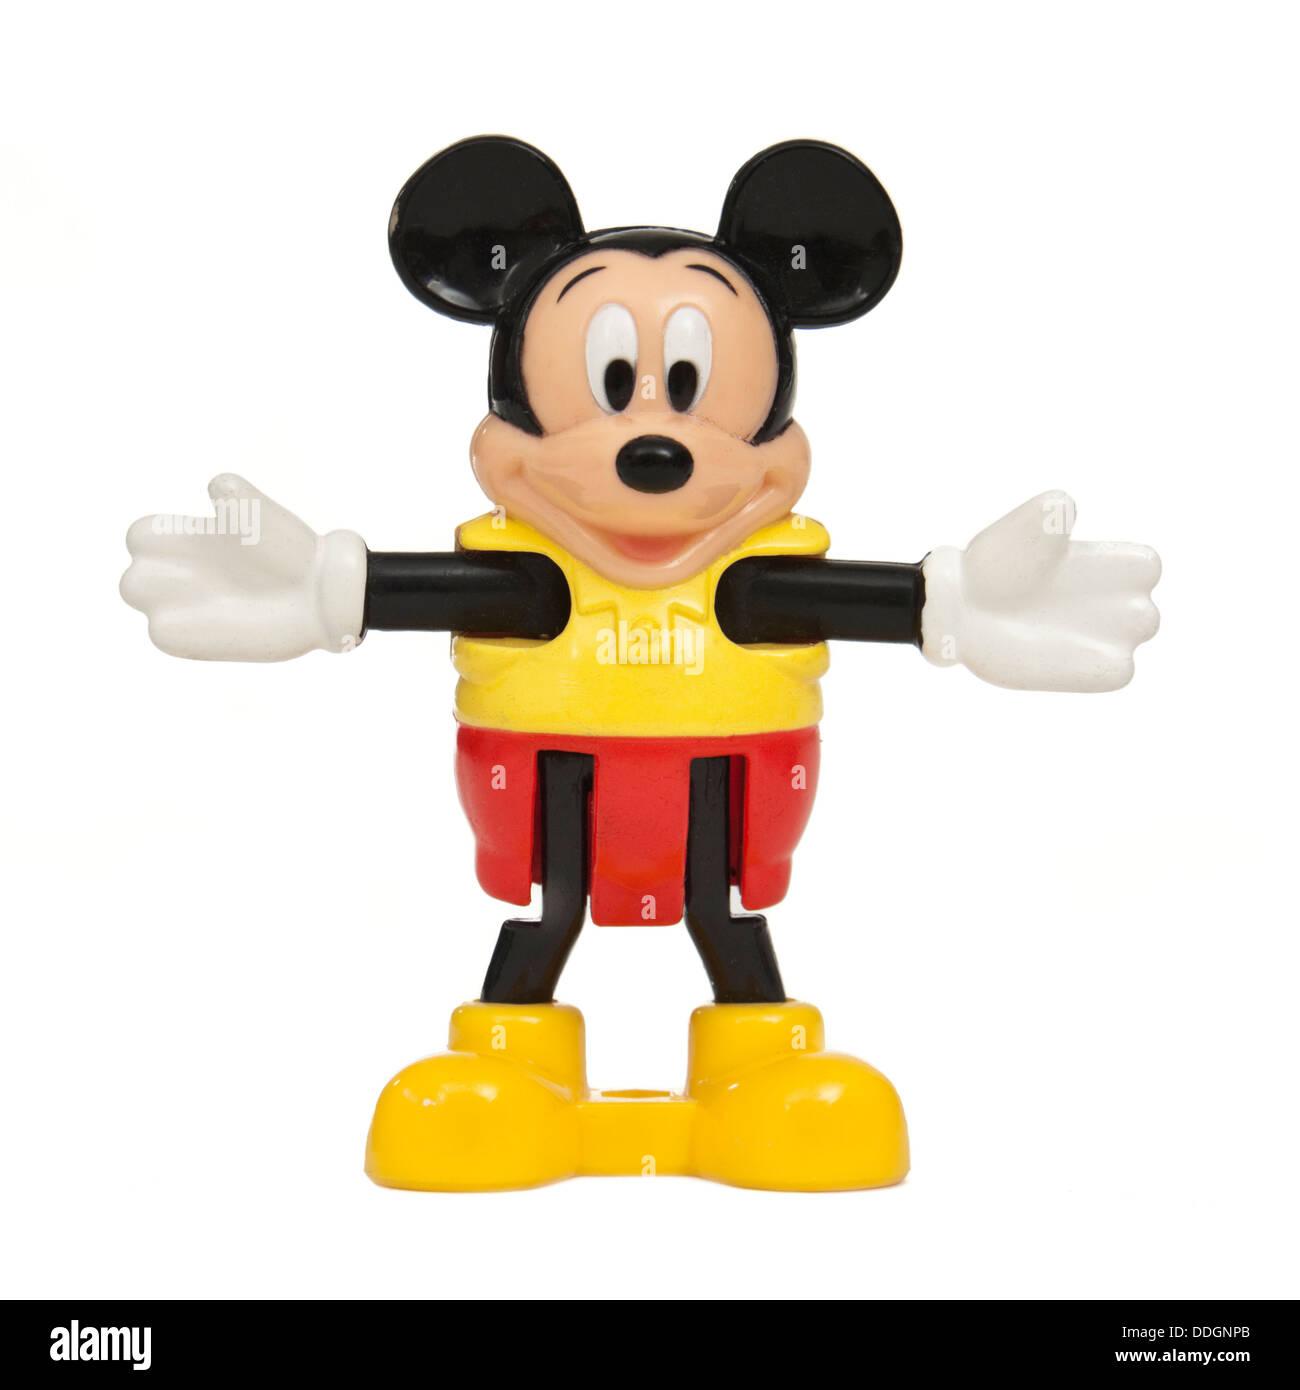 Mcdonalds Toy Stock Photos & Mcdonalds Toy Stock Images - Alamy